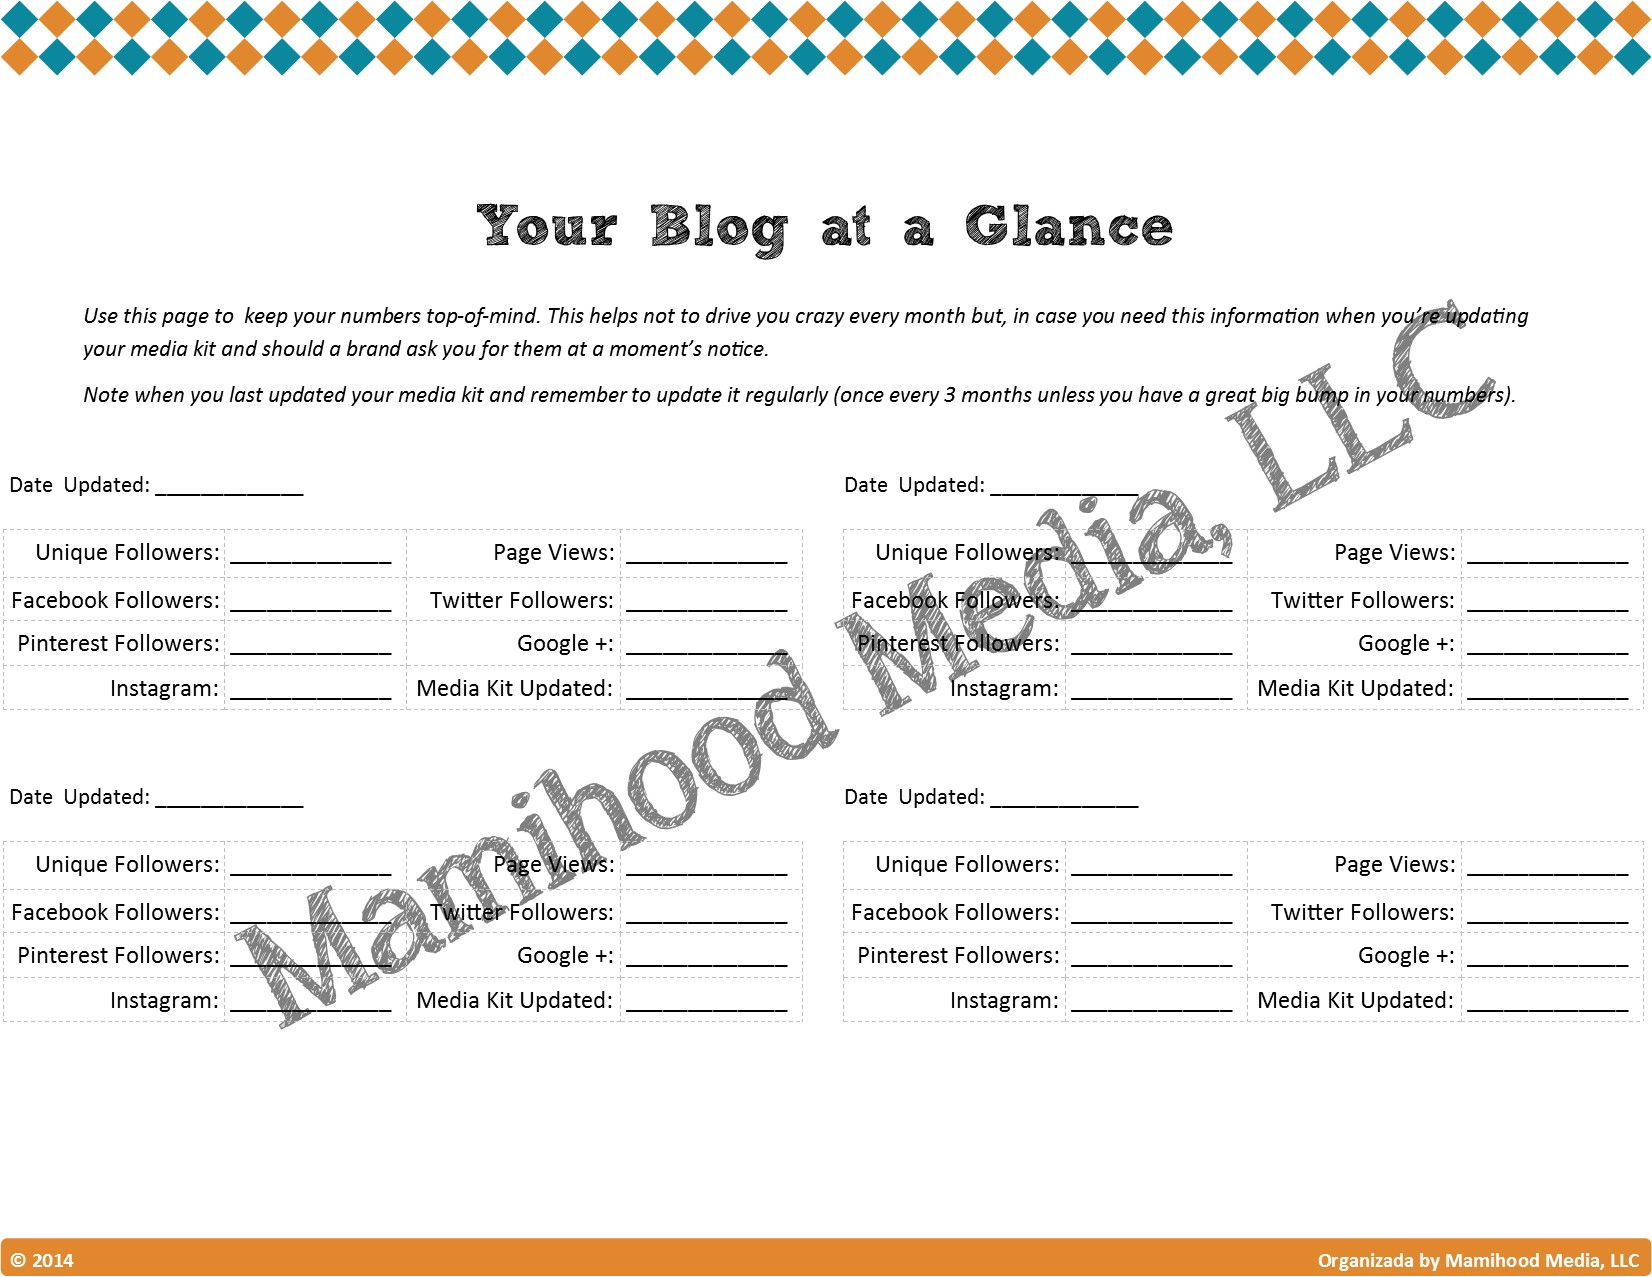 Blogataglance